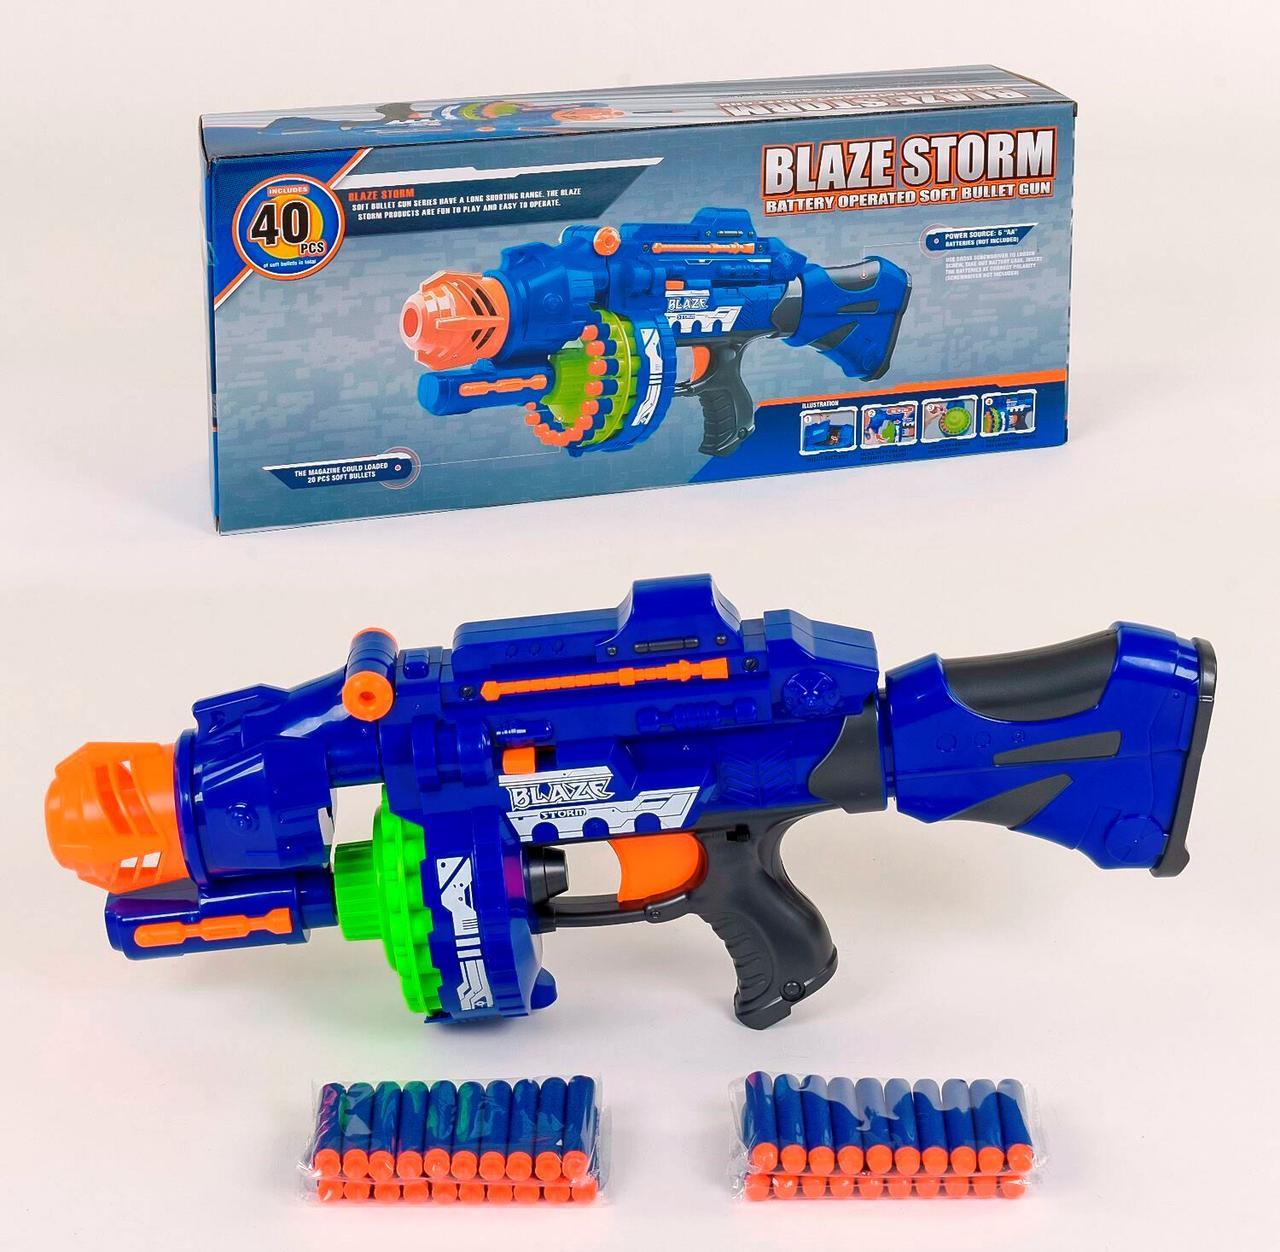 Автомат пулемет бластер 7051 с мягкими пулями, на батарейках